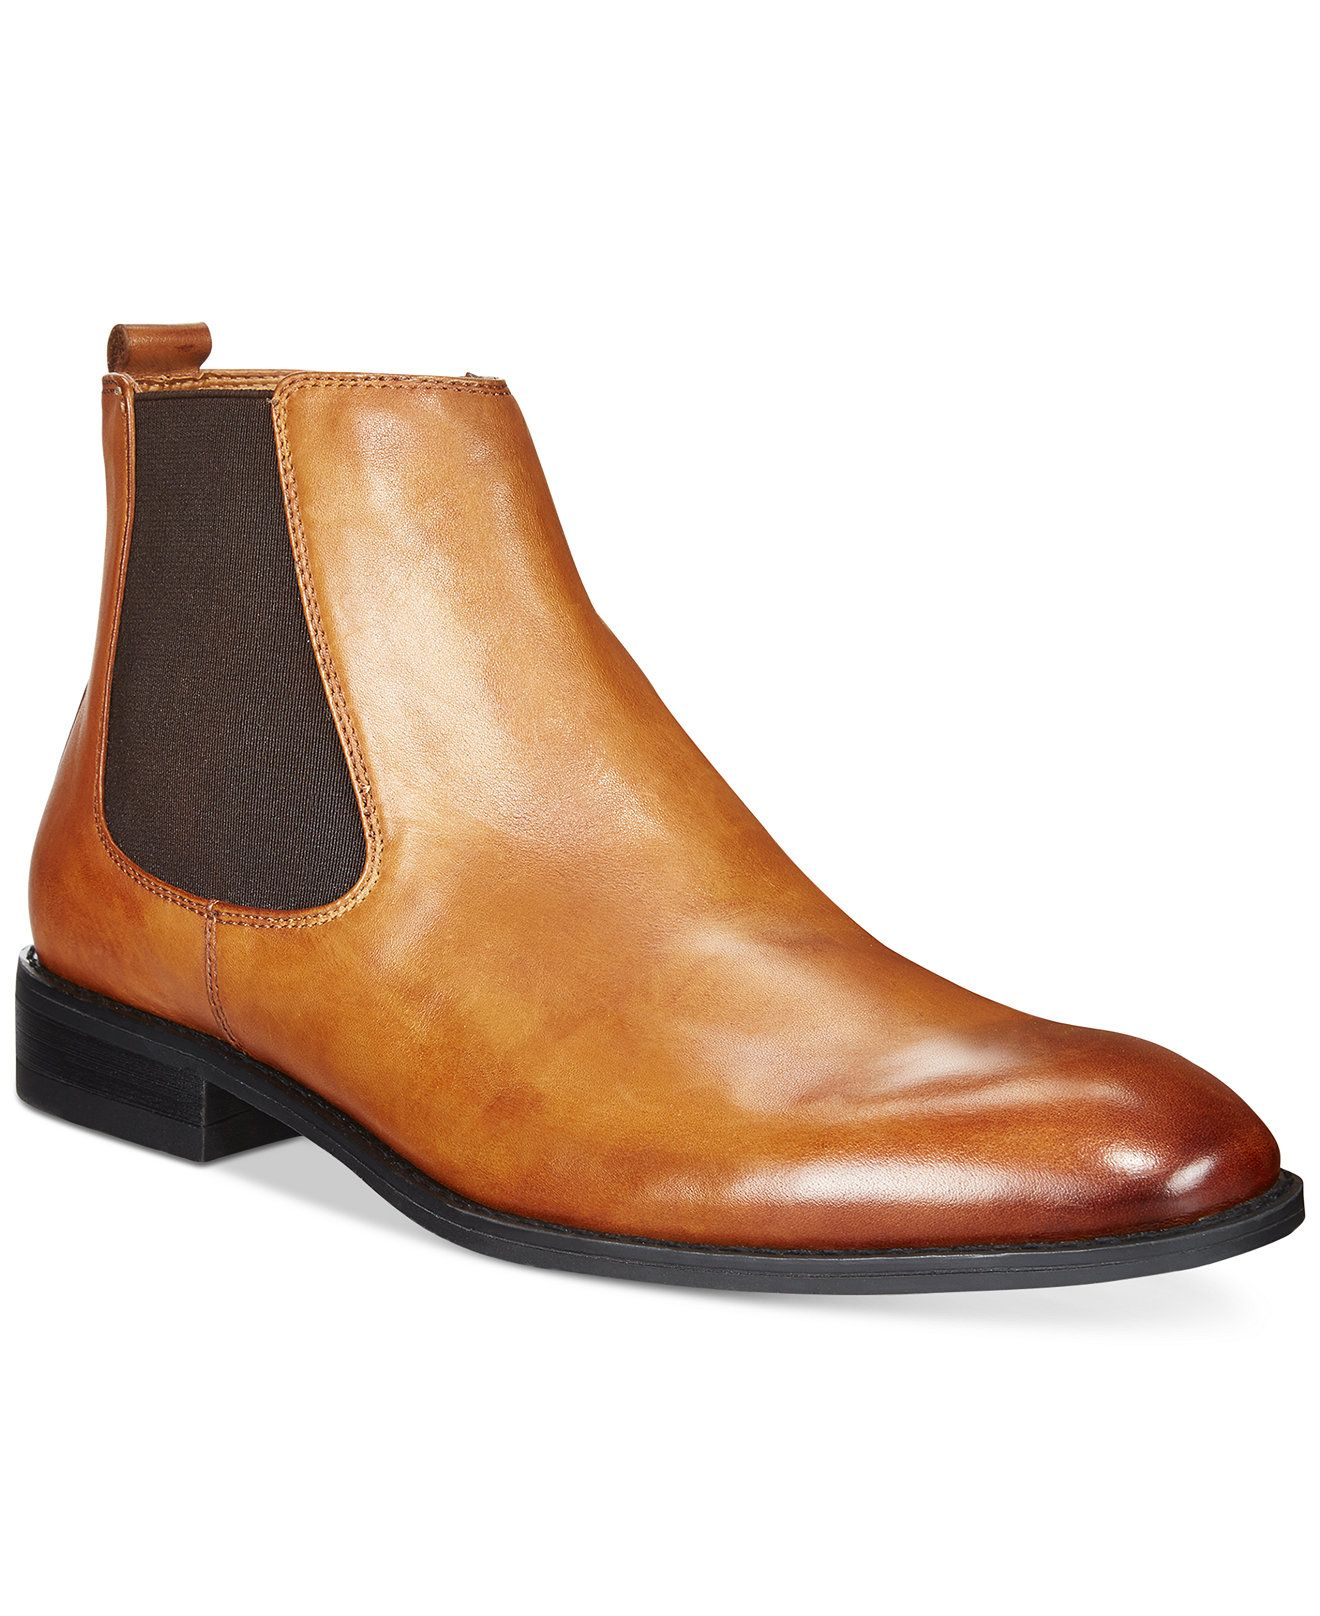 Men's Chelsea Boots at Macy's